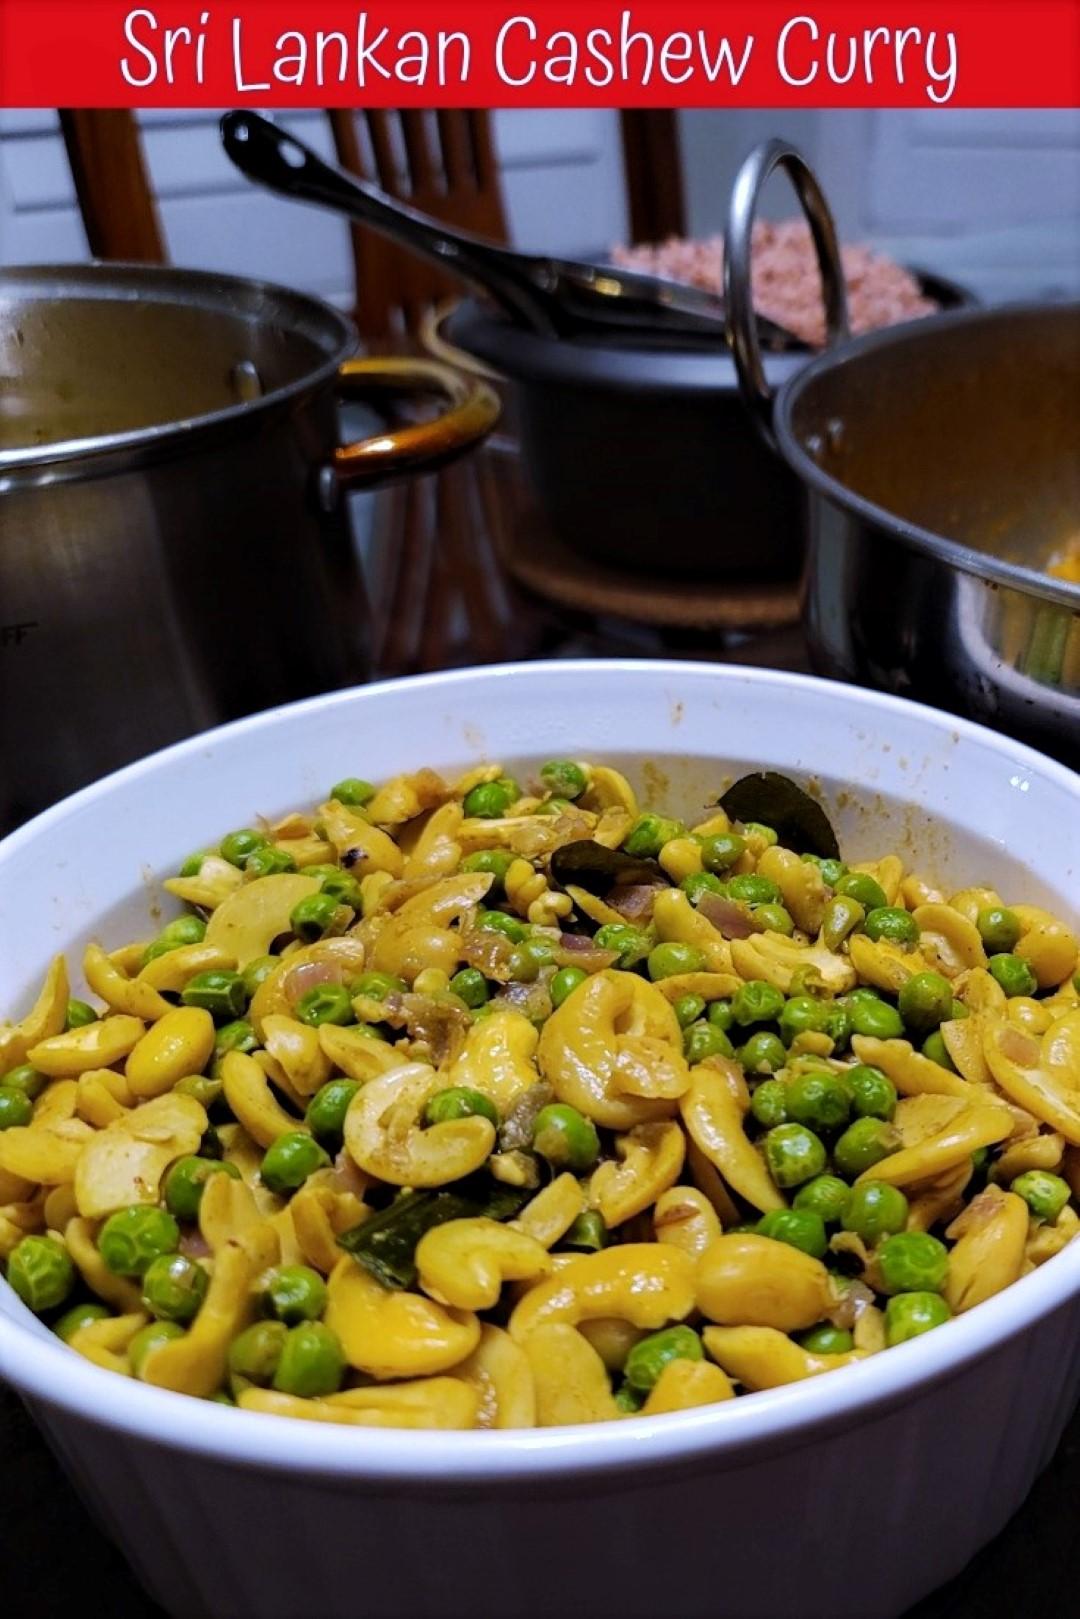 Sri Lankan Cashew Curry from mom